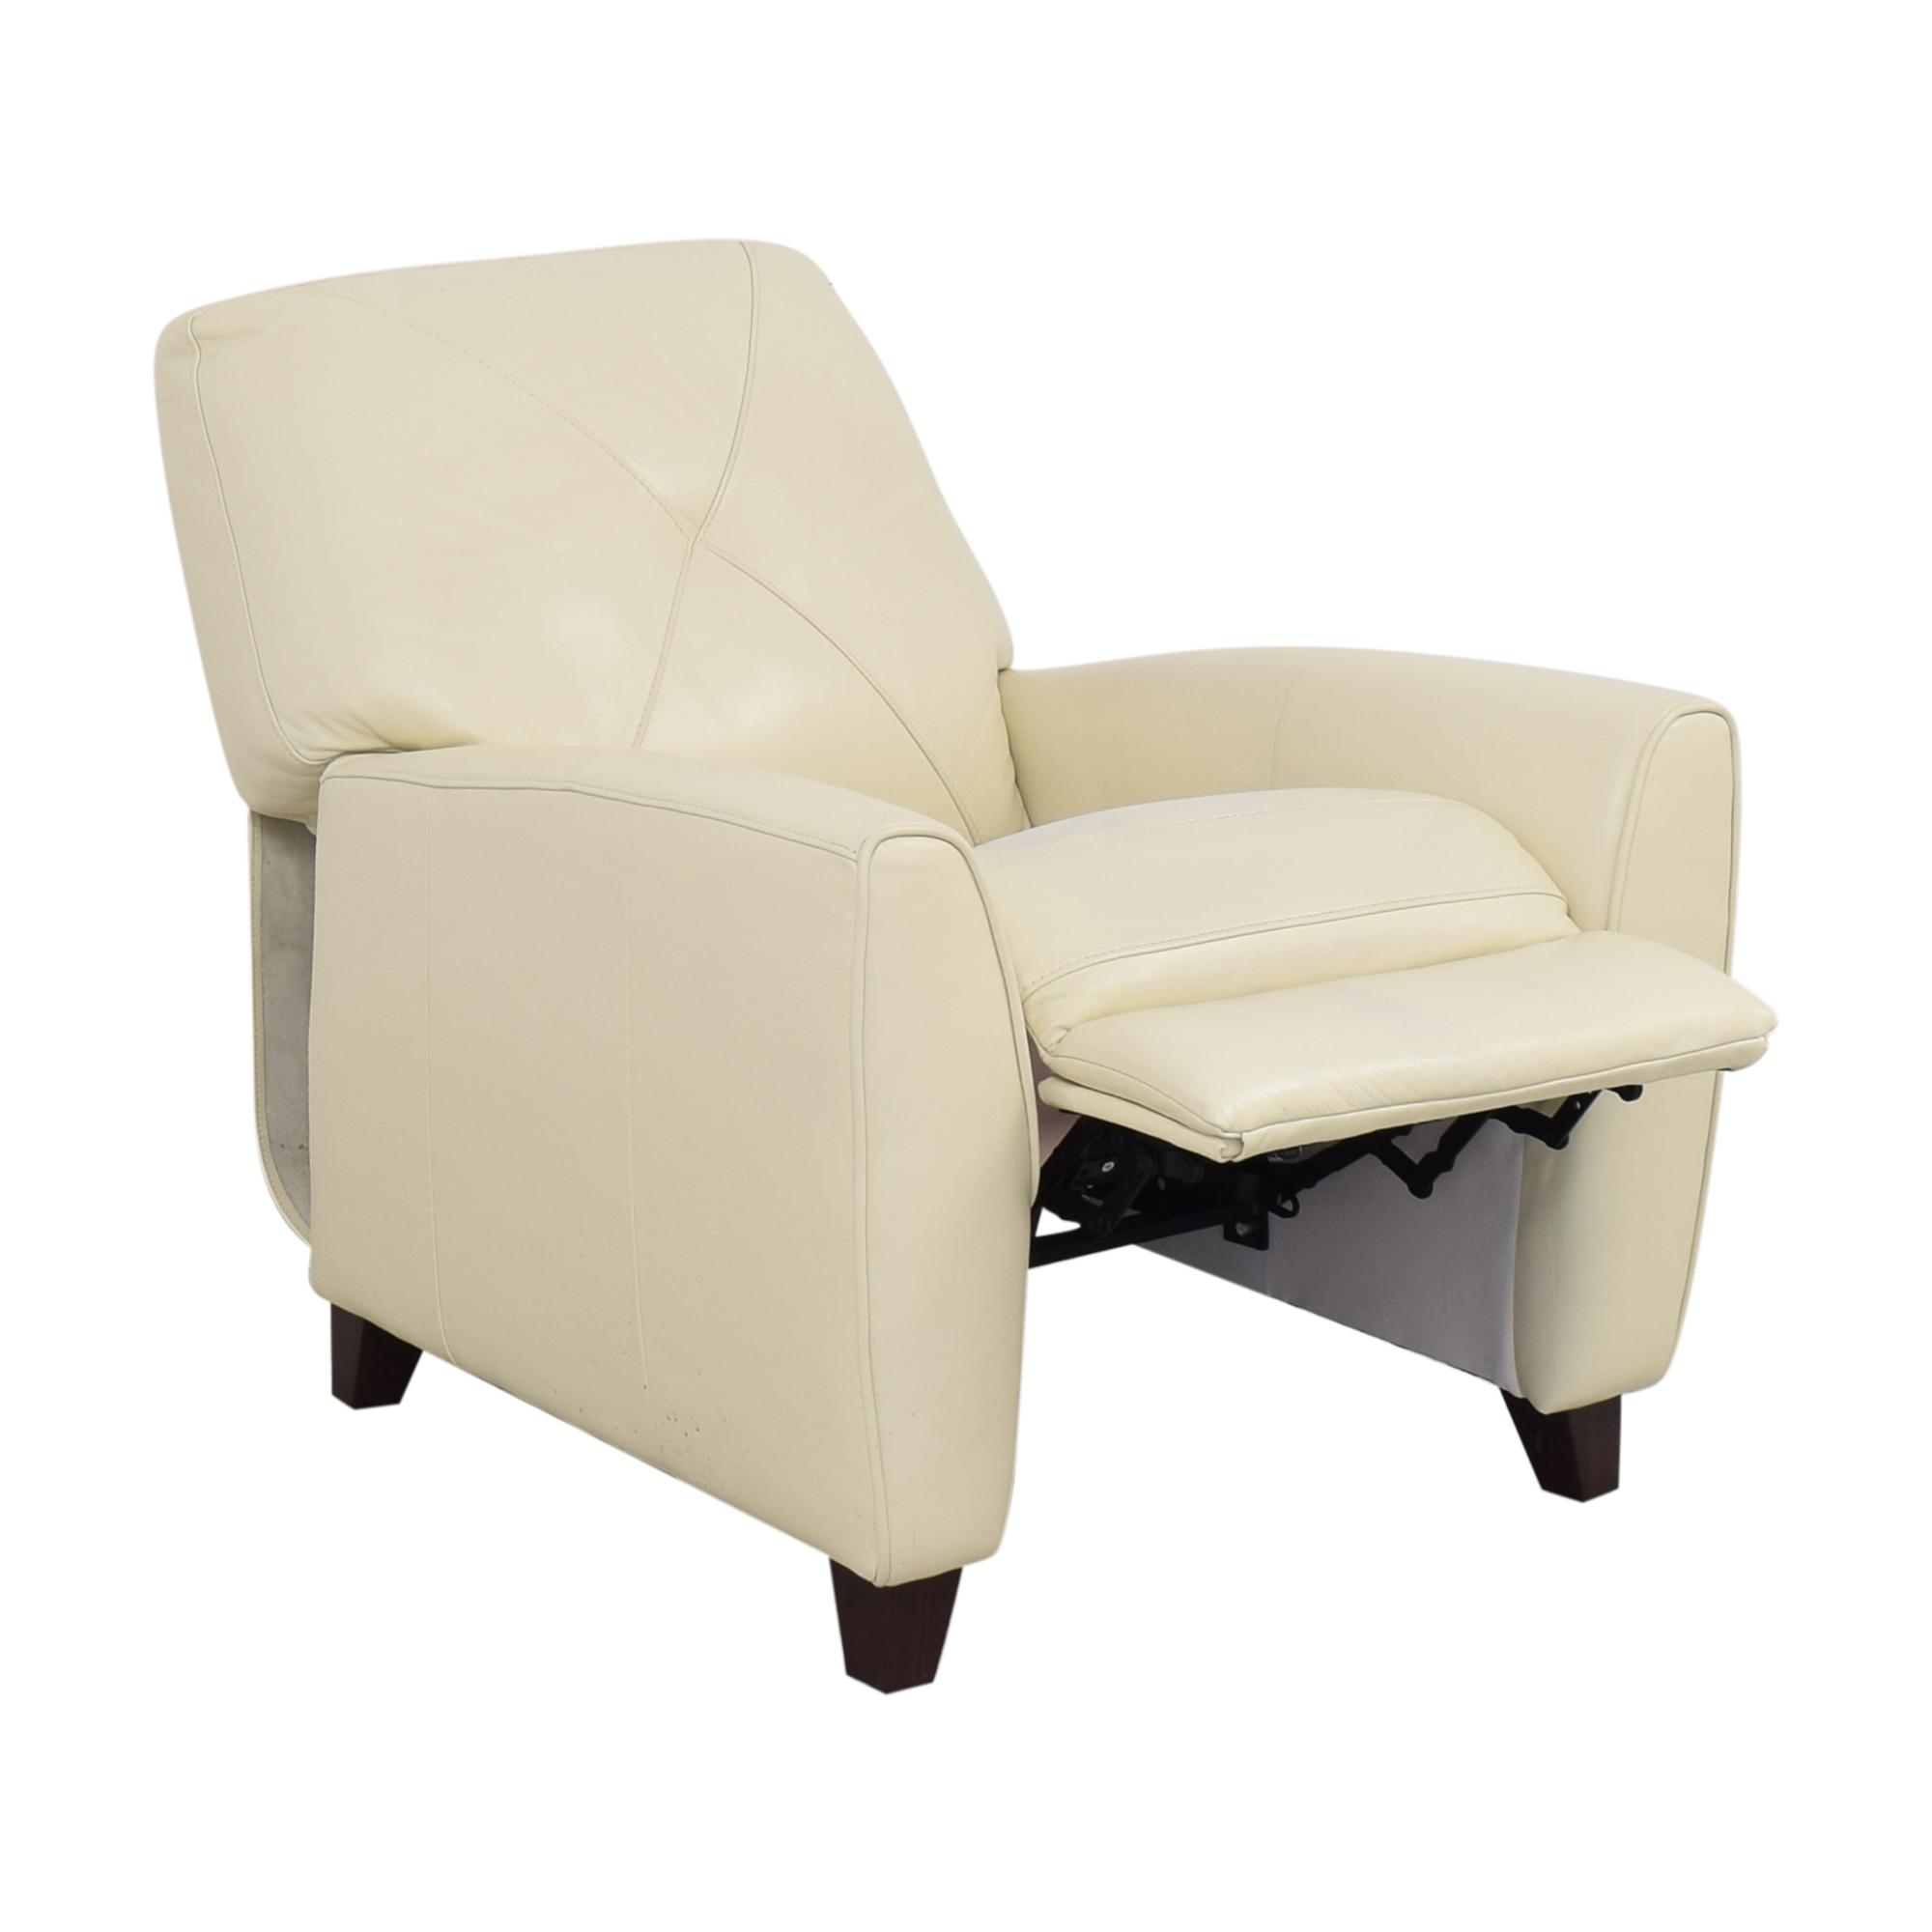 Macy's Macy's Myia Pushback Reclining Chair second hand